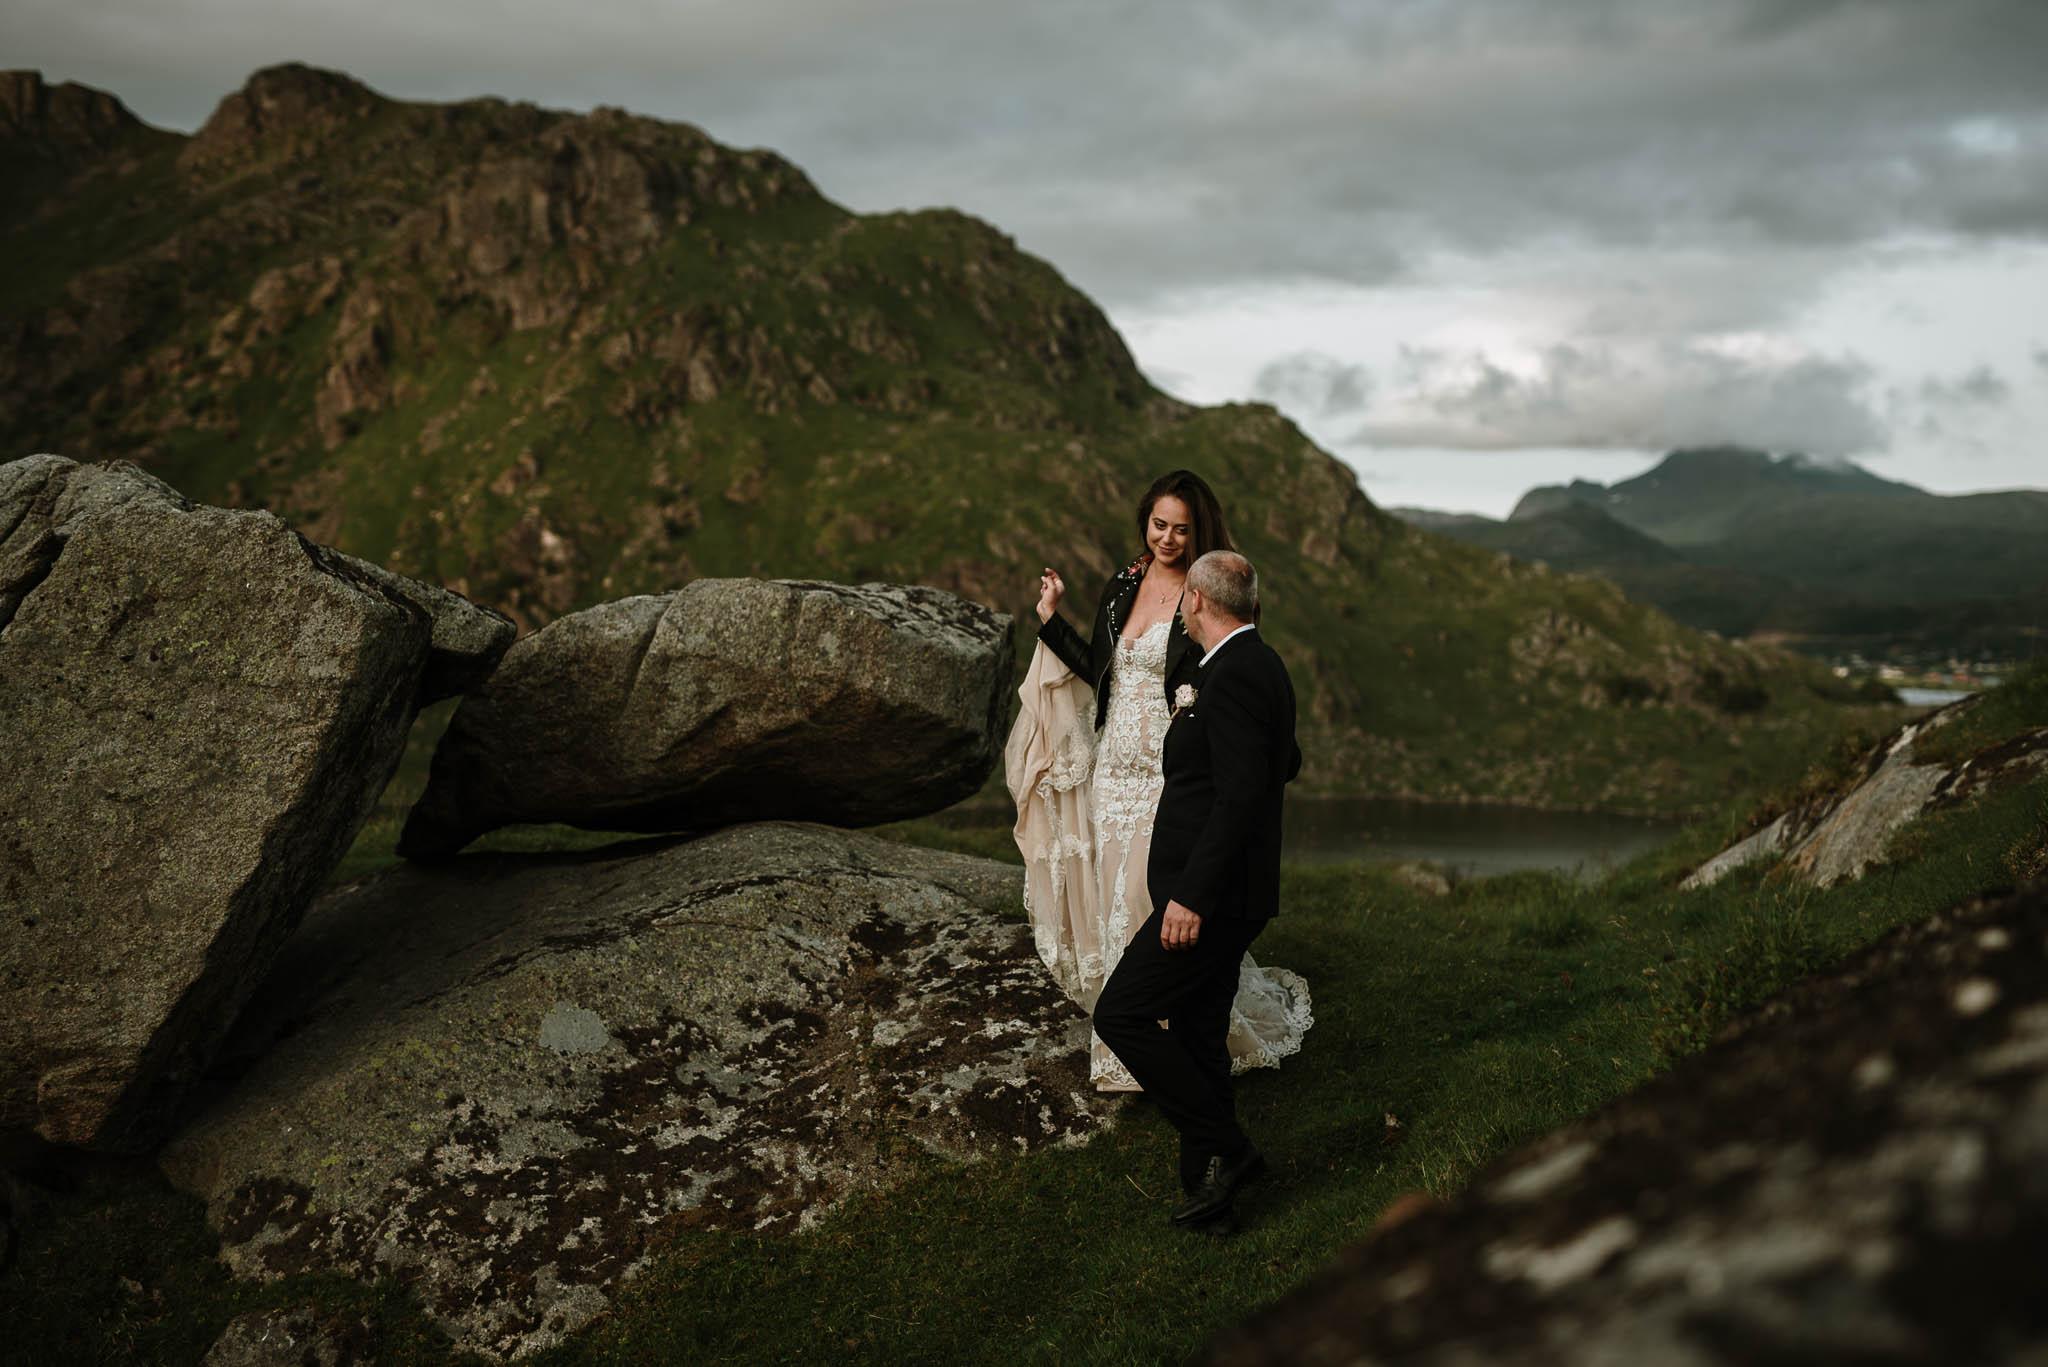 Bryllupsfotograf i Lofoten - wedding photographer Lofoten - bryllup harstad-59.jpg